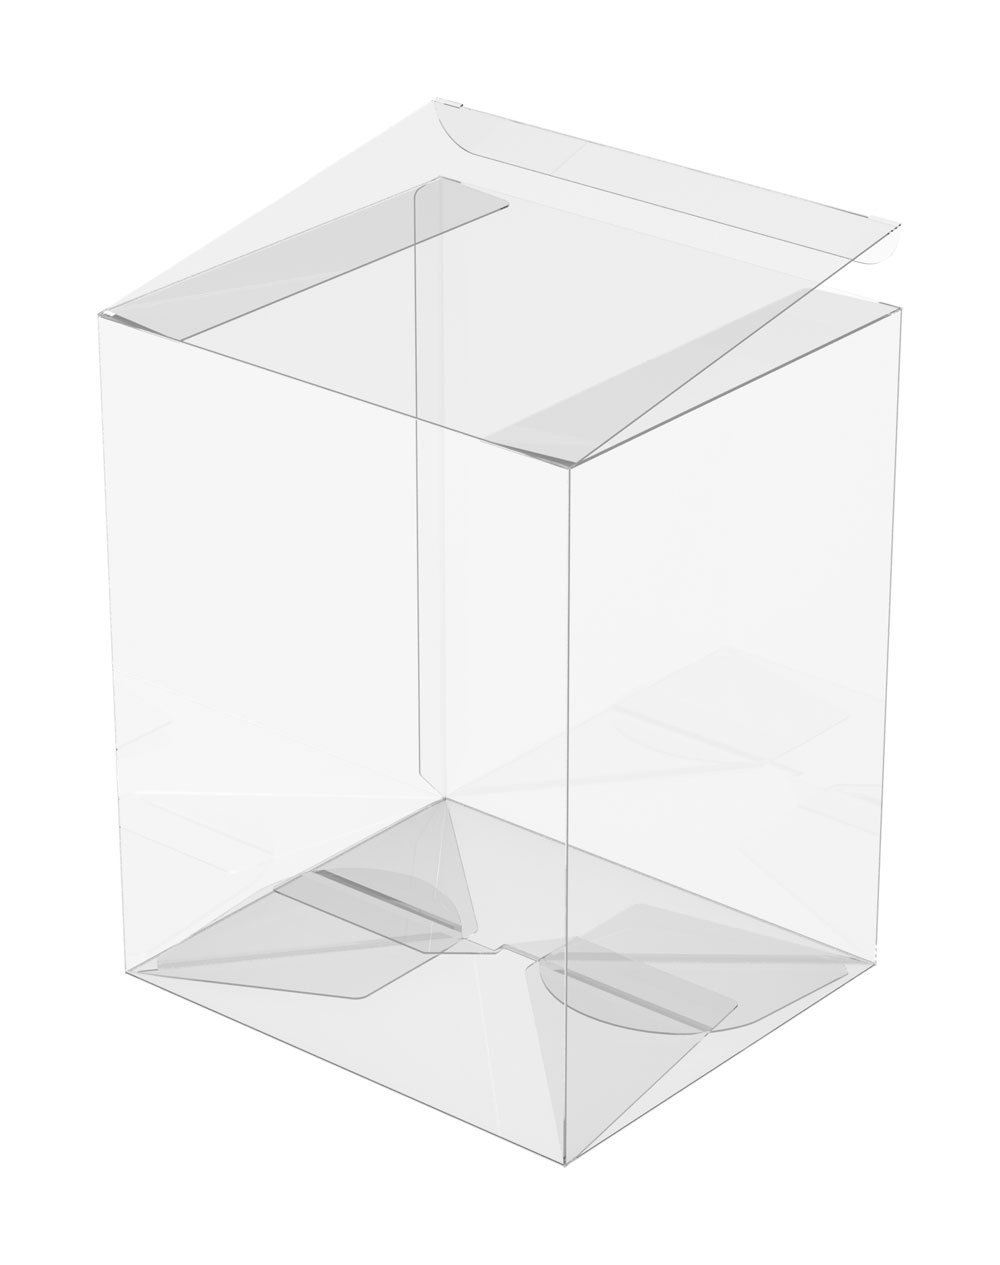 "Caixa Protetora para Funko Pop 6"" (Big Size)"